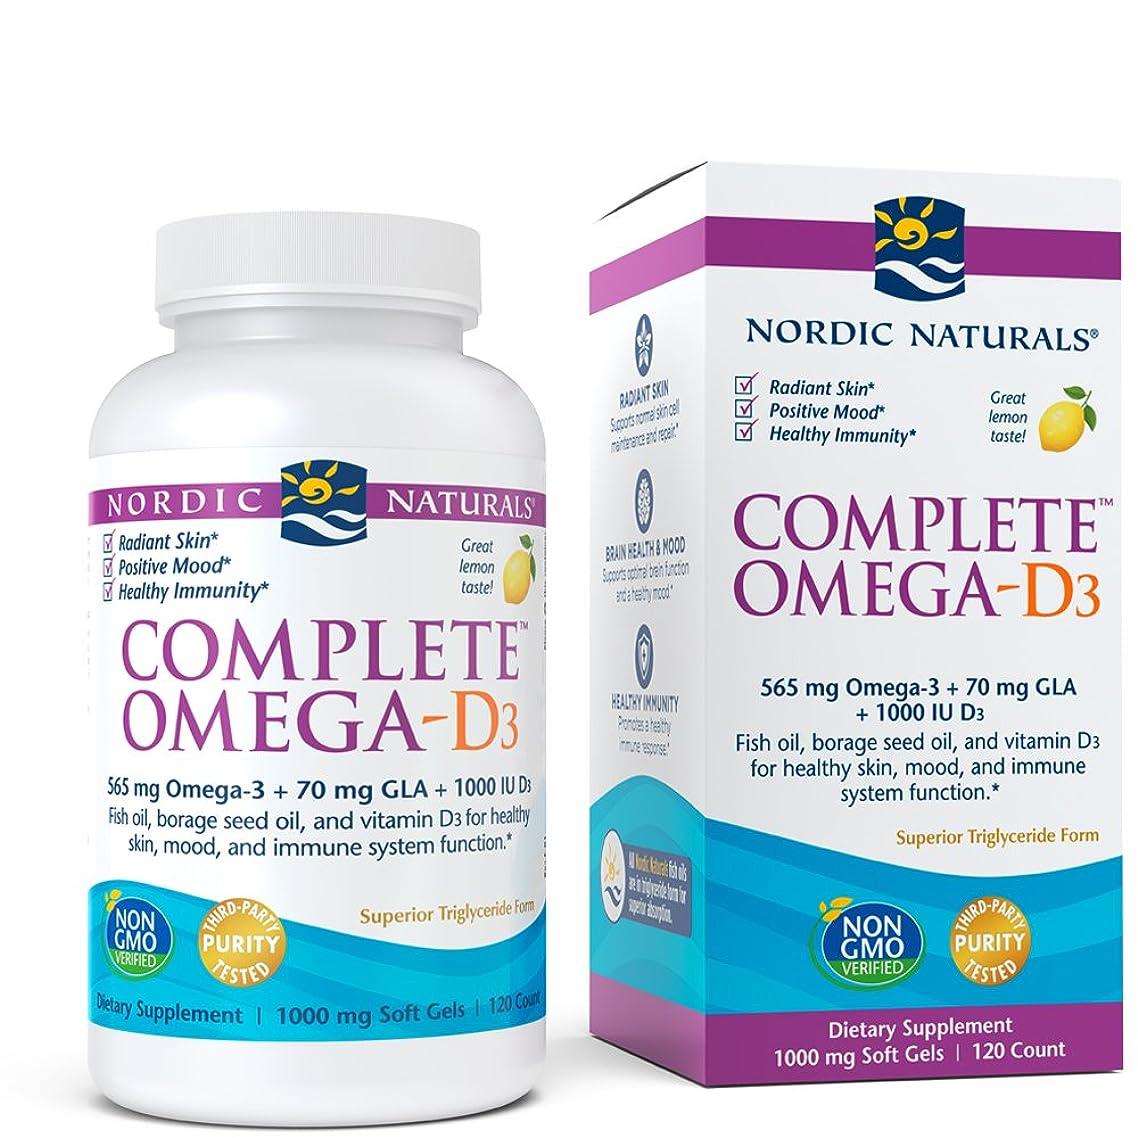 Nordic Naturals - Complete Omega-D3, Additional Bone, Mood, and Immune Support, 120 Soft Gels